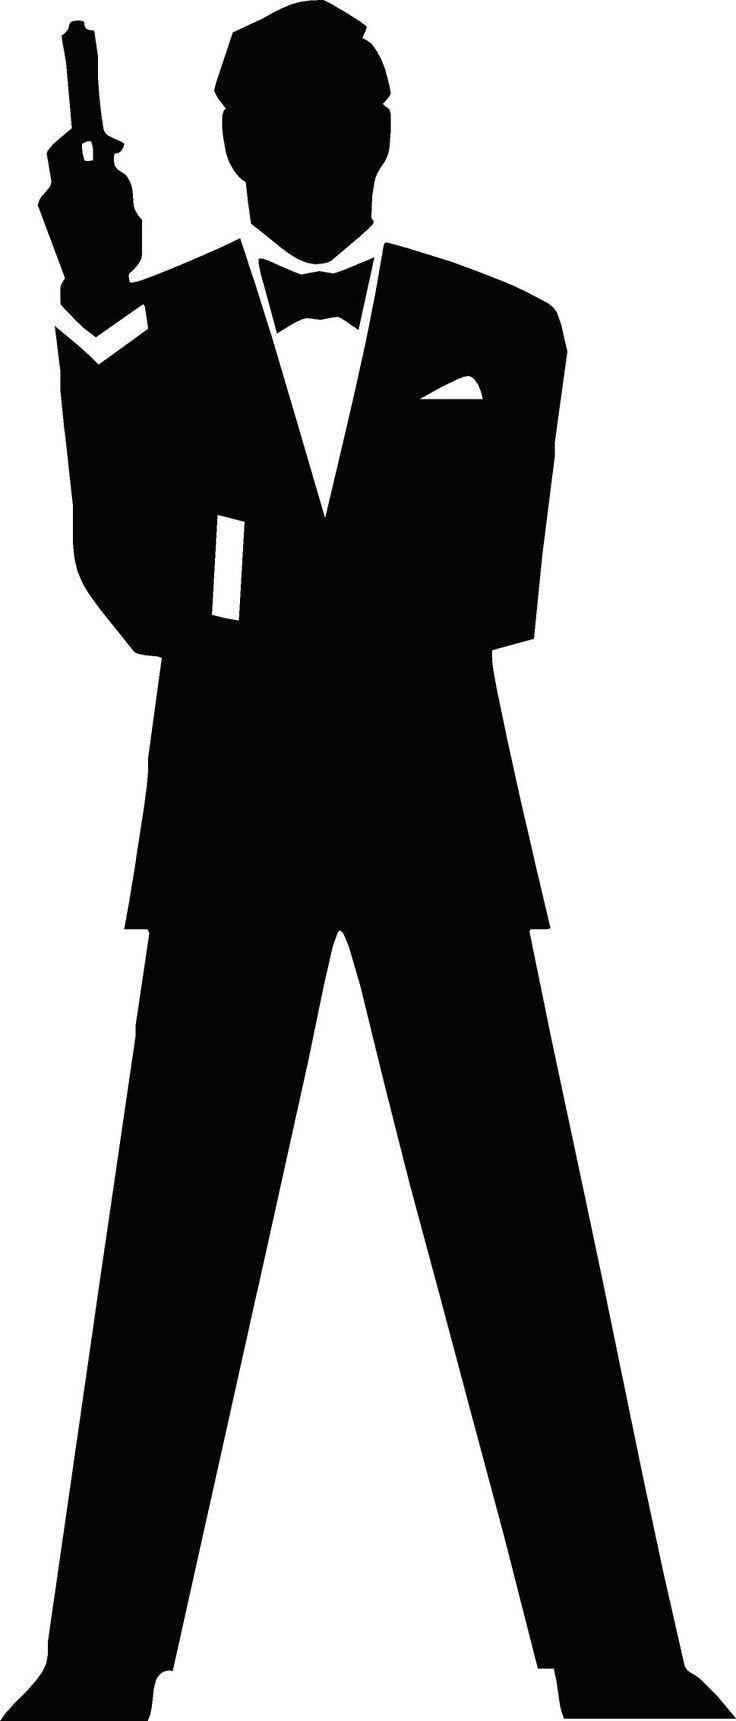 736x1721 Free Vector James Bond Secret Agent 007 Black Amp White Silo Vector